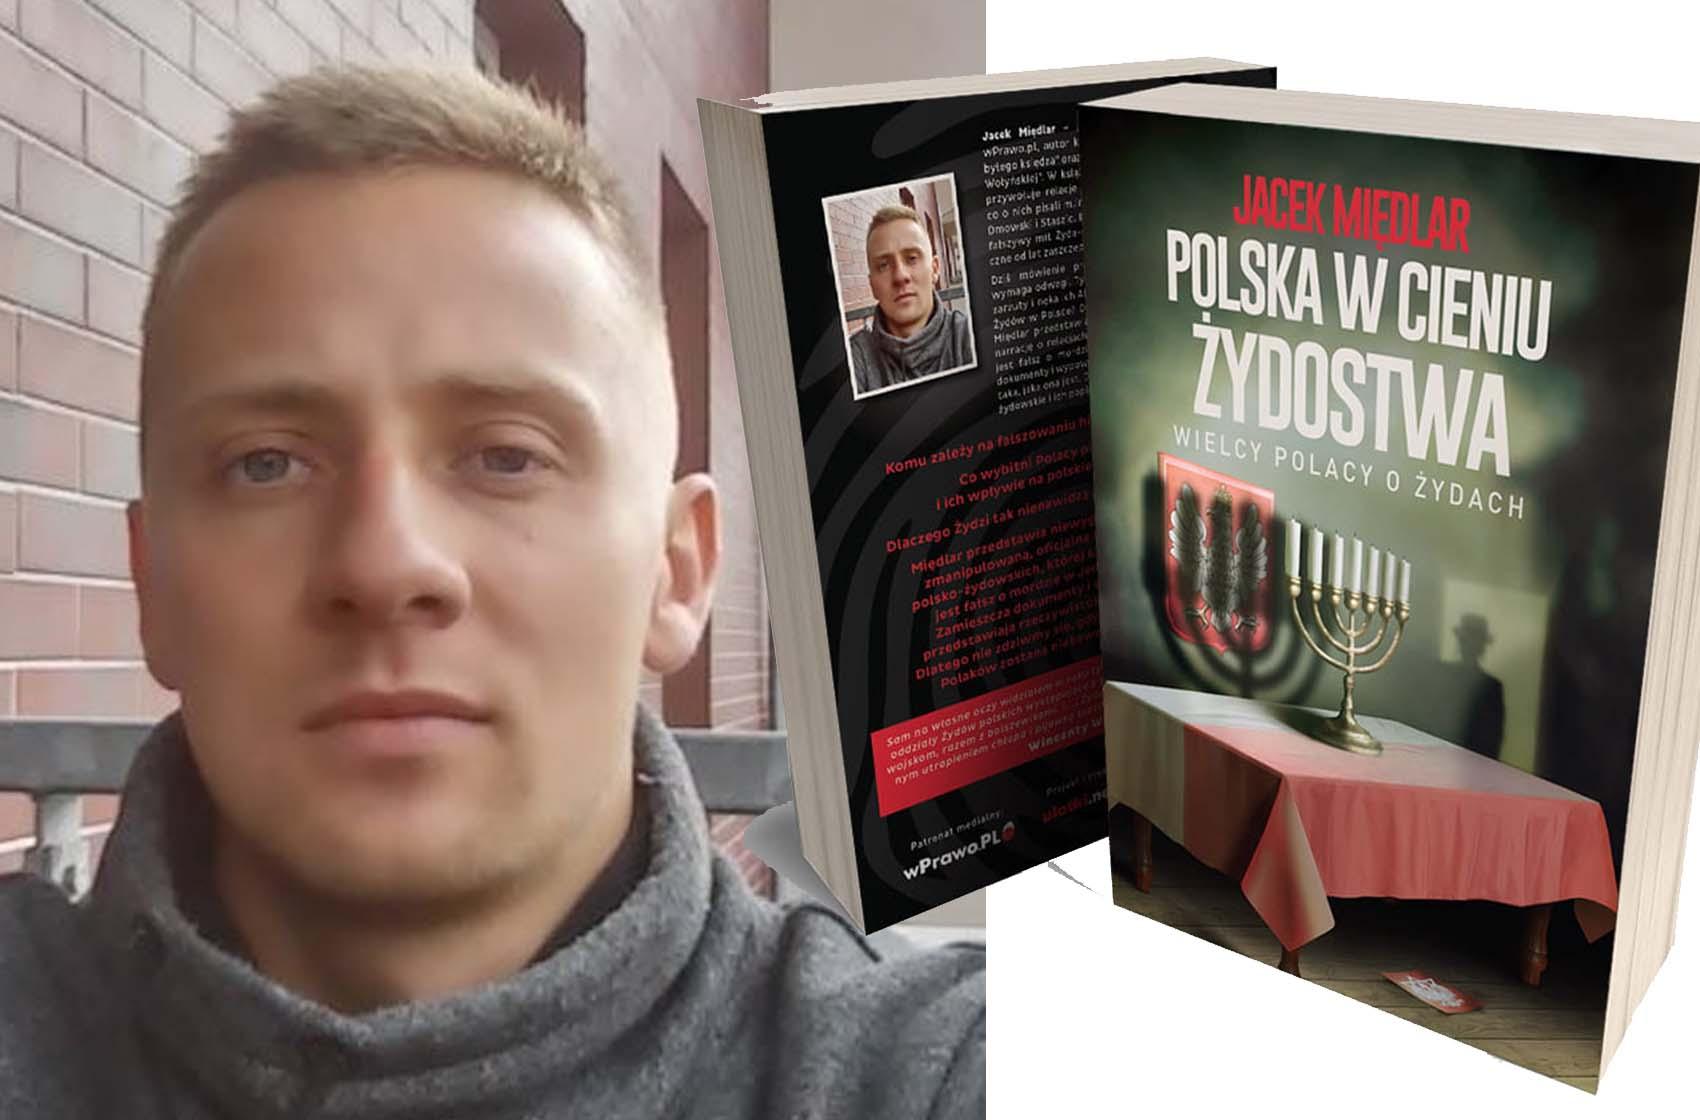 Collage TT JM/wPrawo.pl